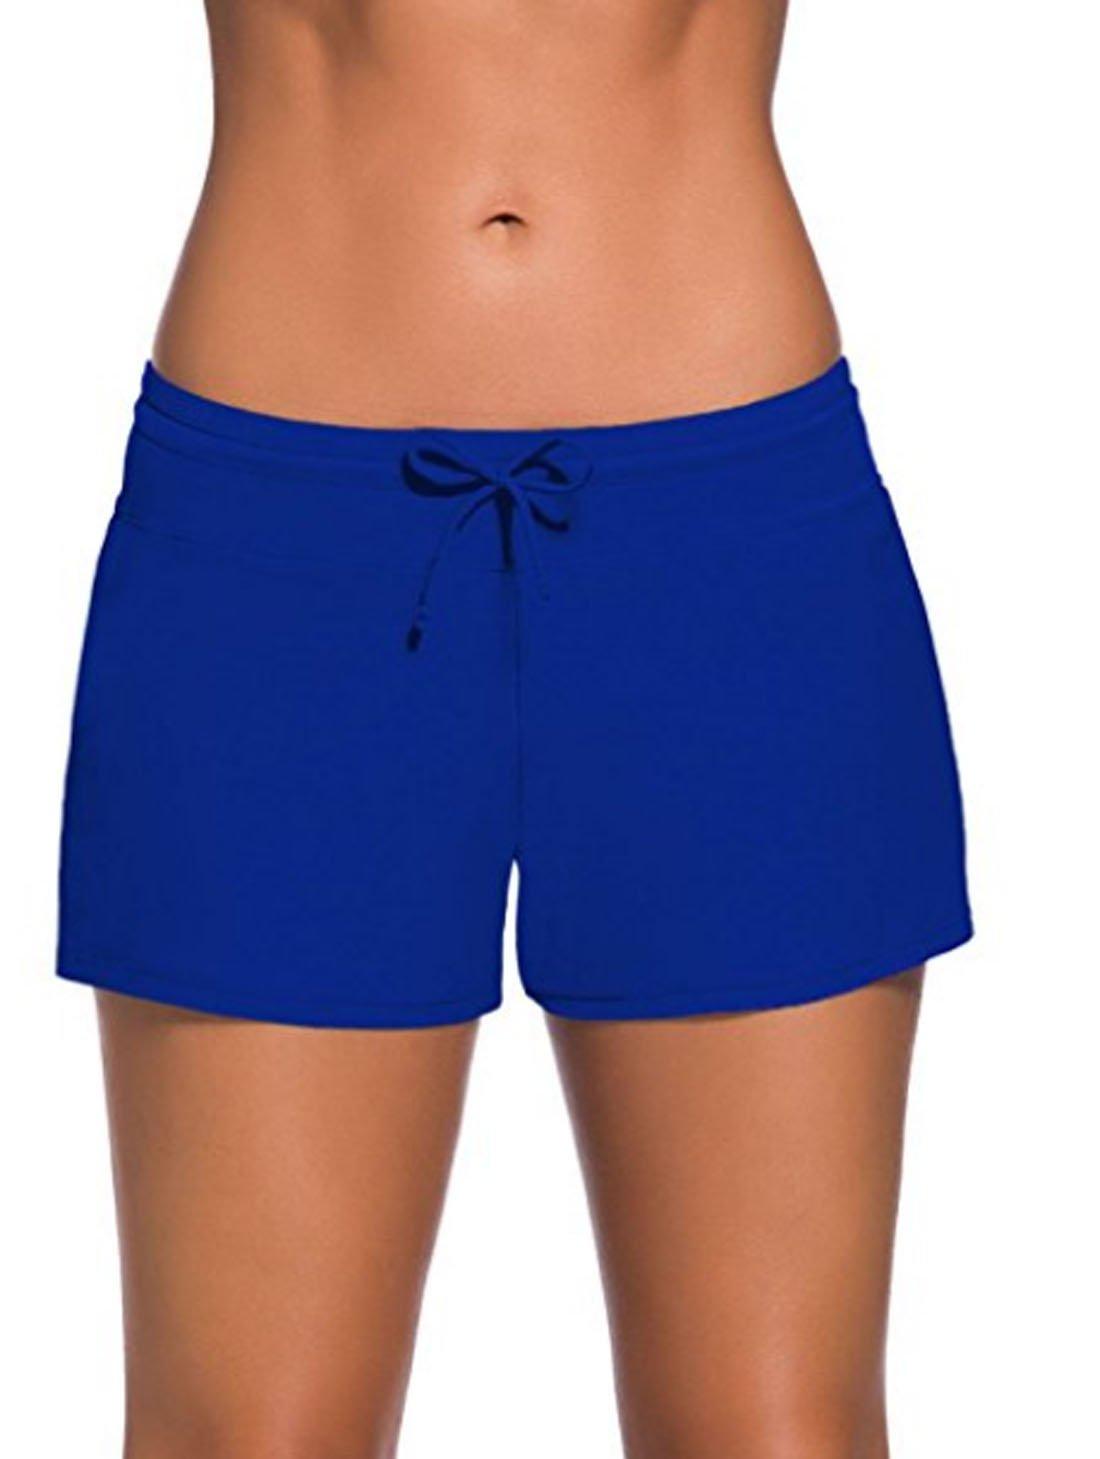 FIYOTE Women Sports Summer Bottom Slit Swim Beach Board Shorts XXX-Large Size Navy Blue